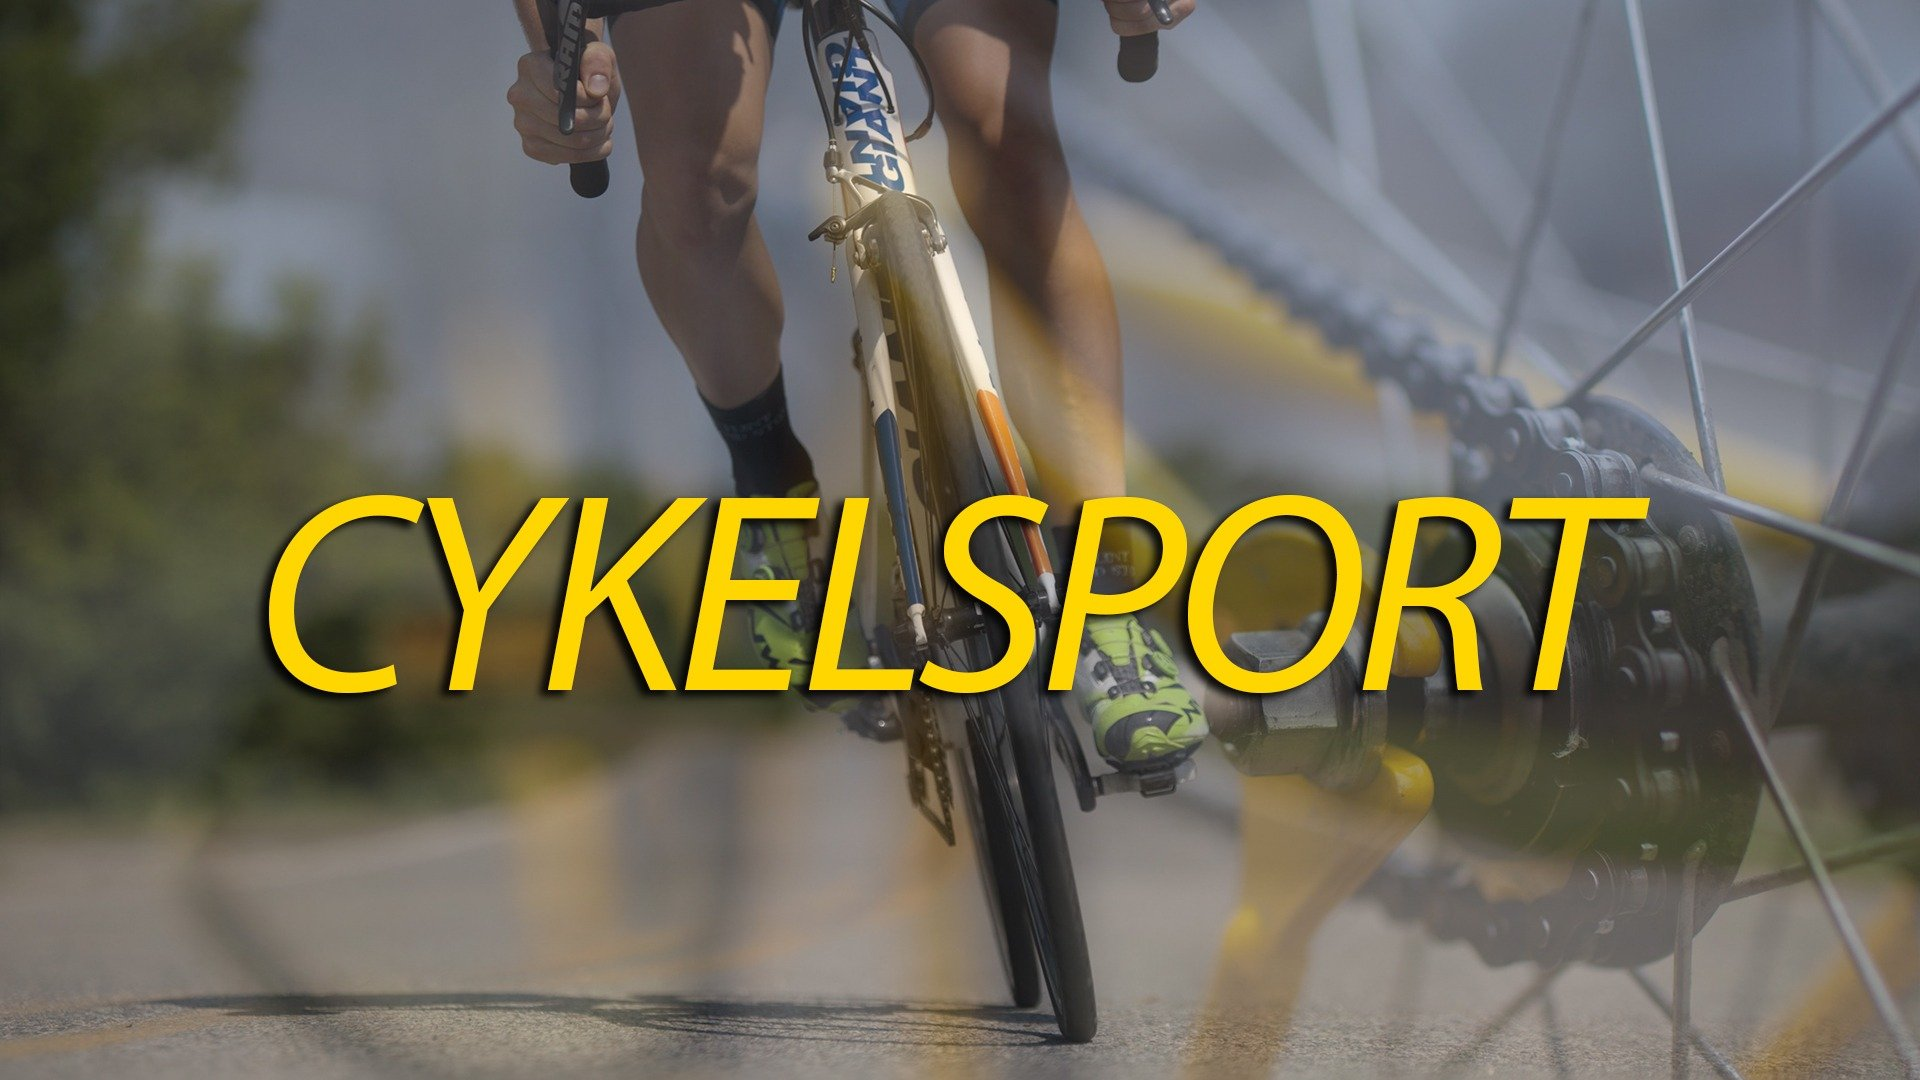 Cykelsport